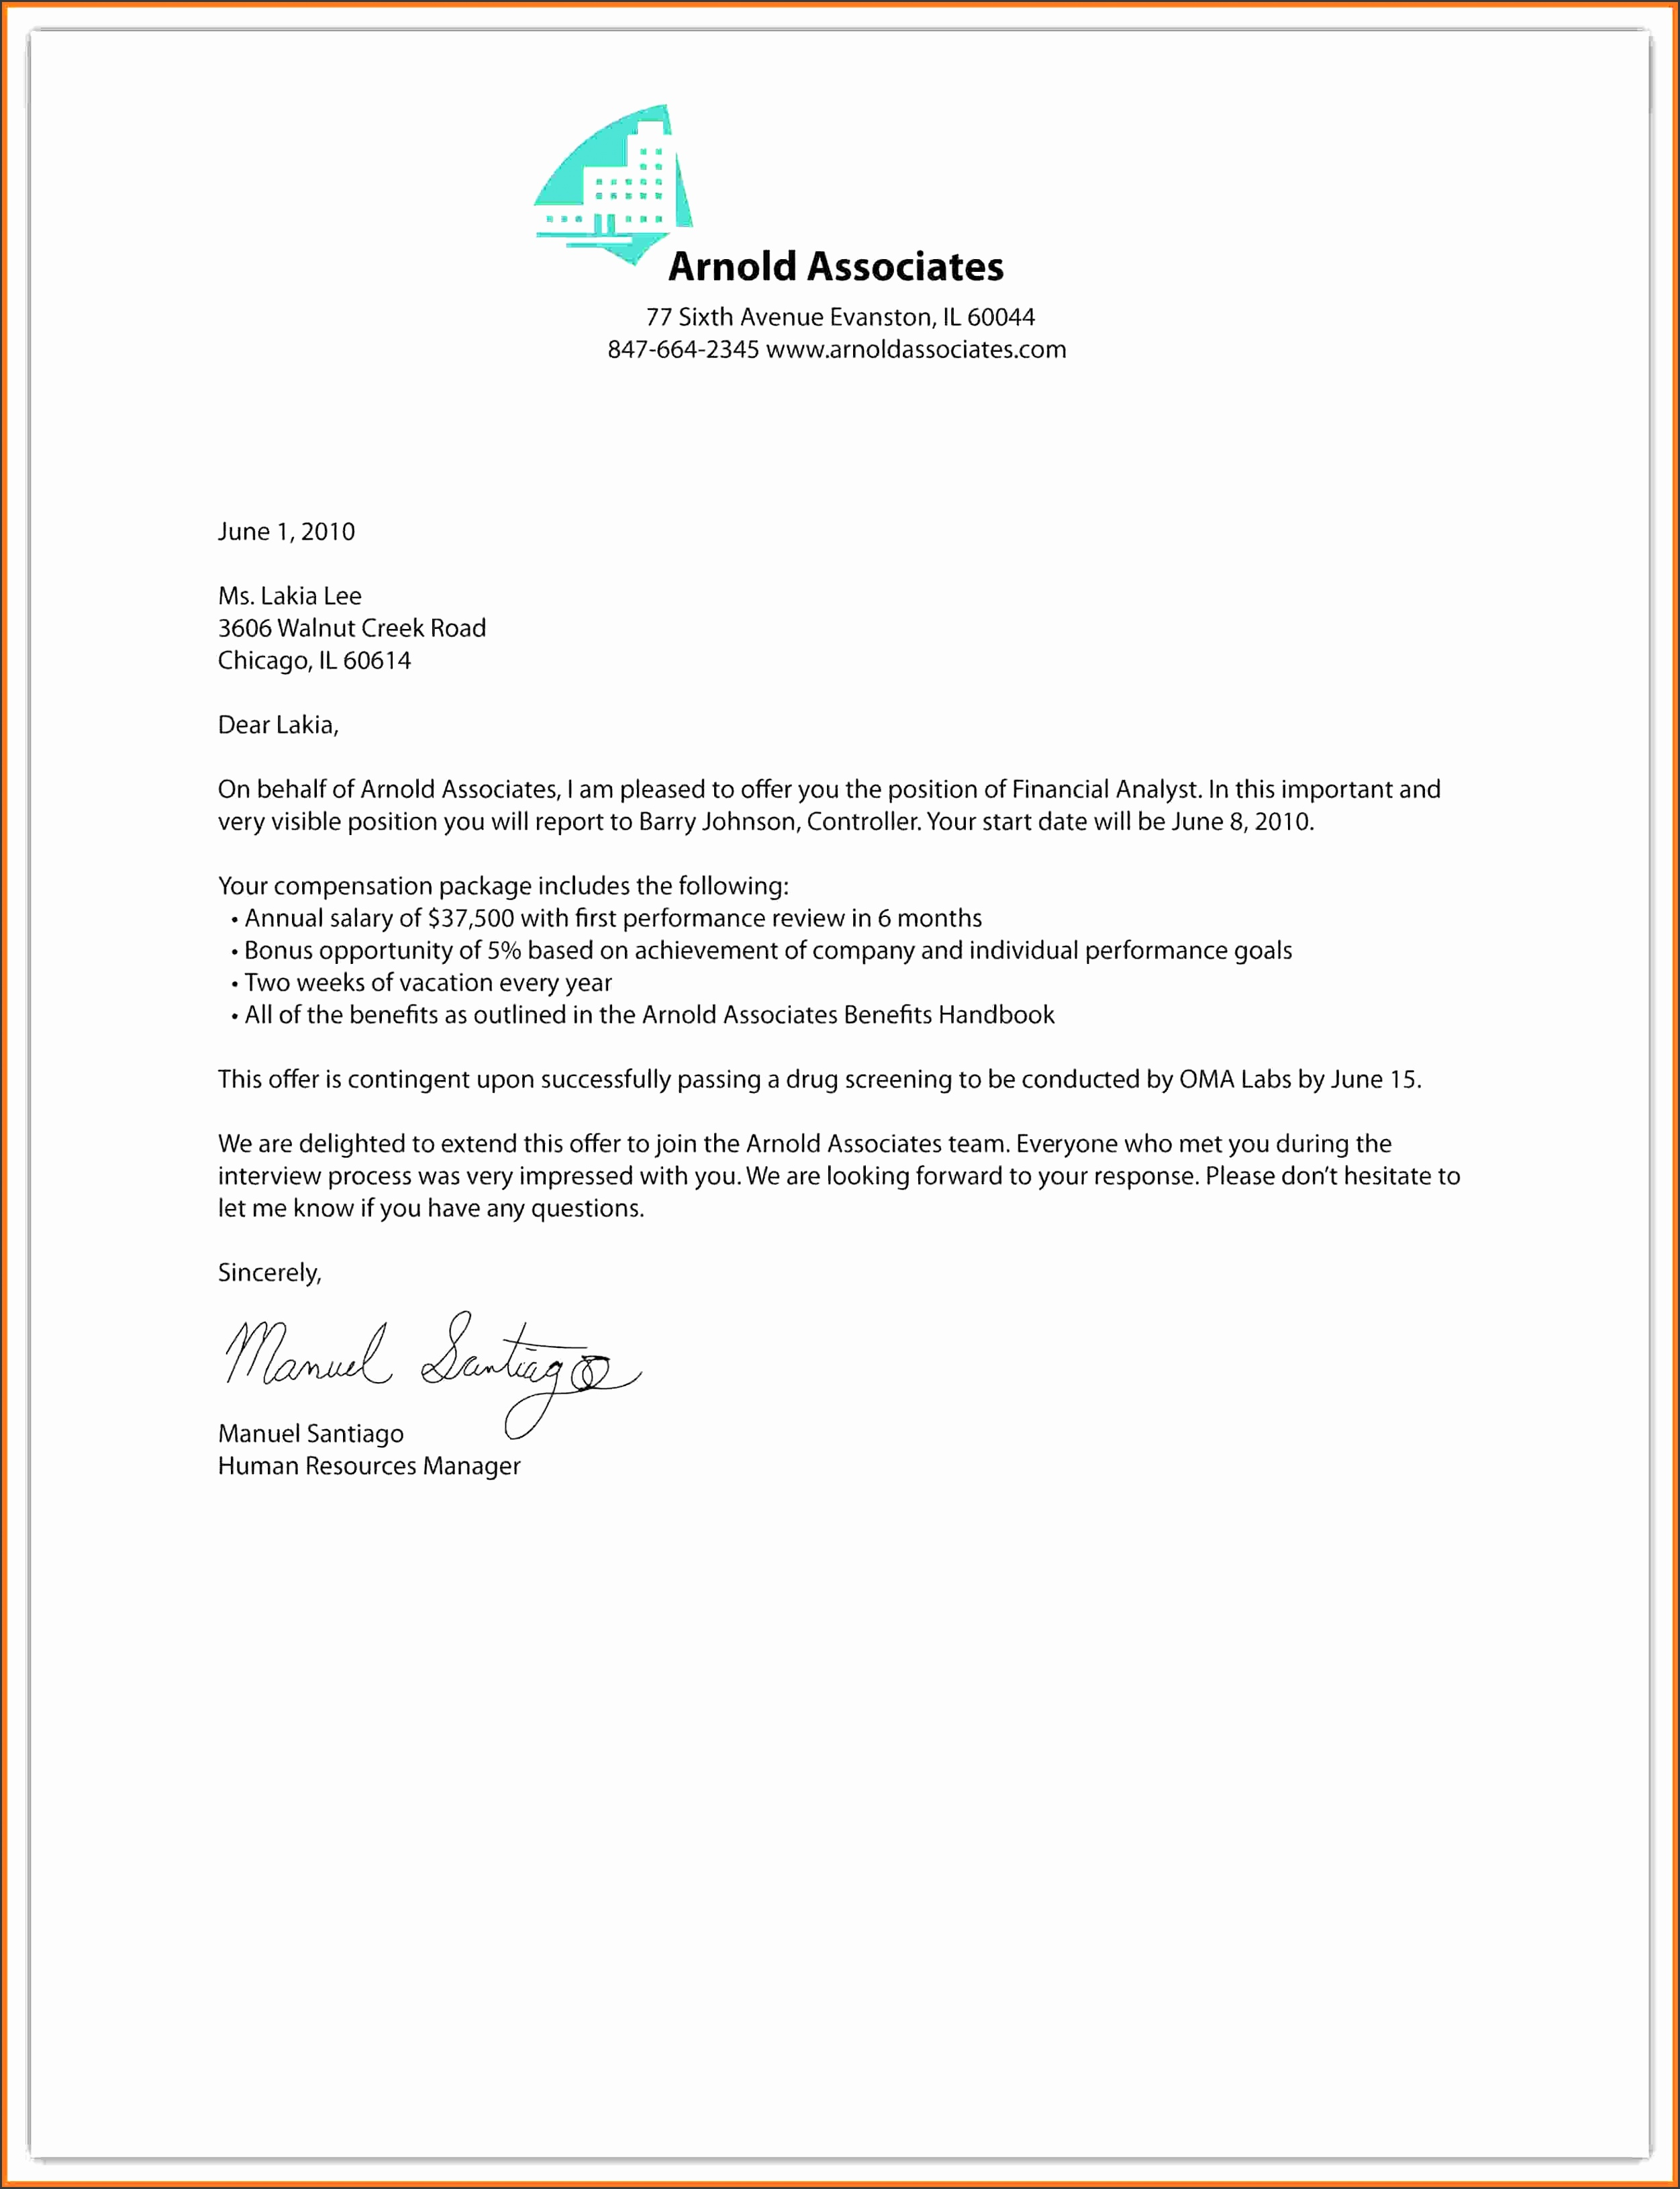 10 fer Employment Letter Marital Settlements Information